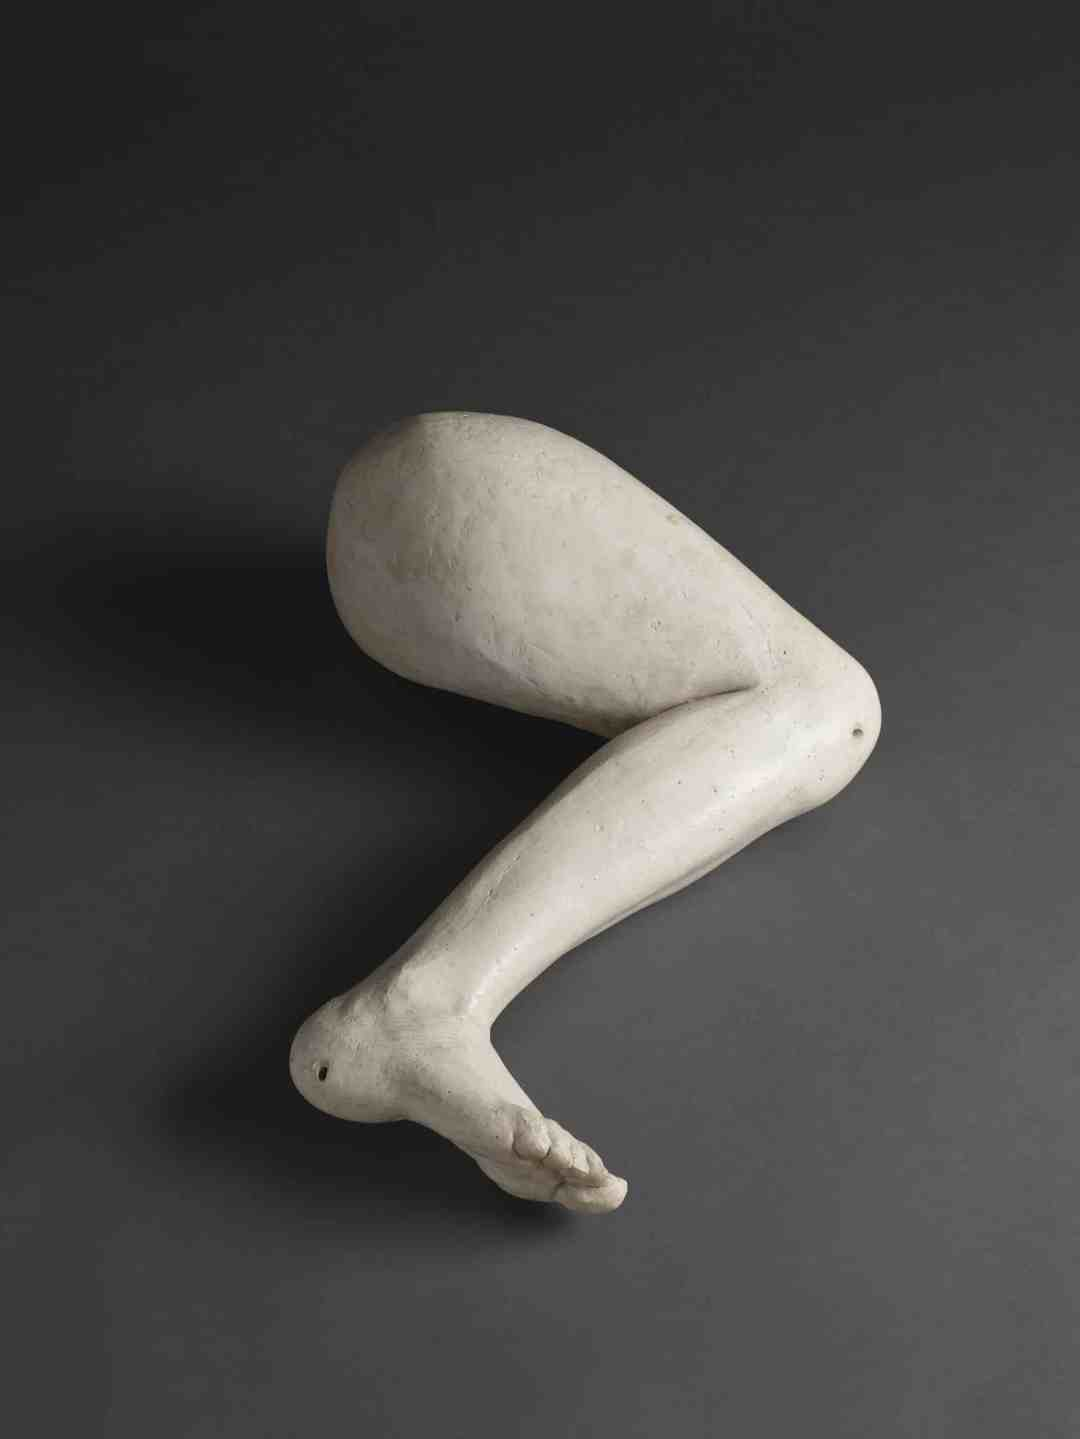 Alina Szapocznikow, Noga (Leg), 1962, Plaster, 20 x 50 x 63.5 cm / 7 7/8 x 19 5/8 x 25 in